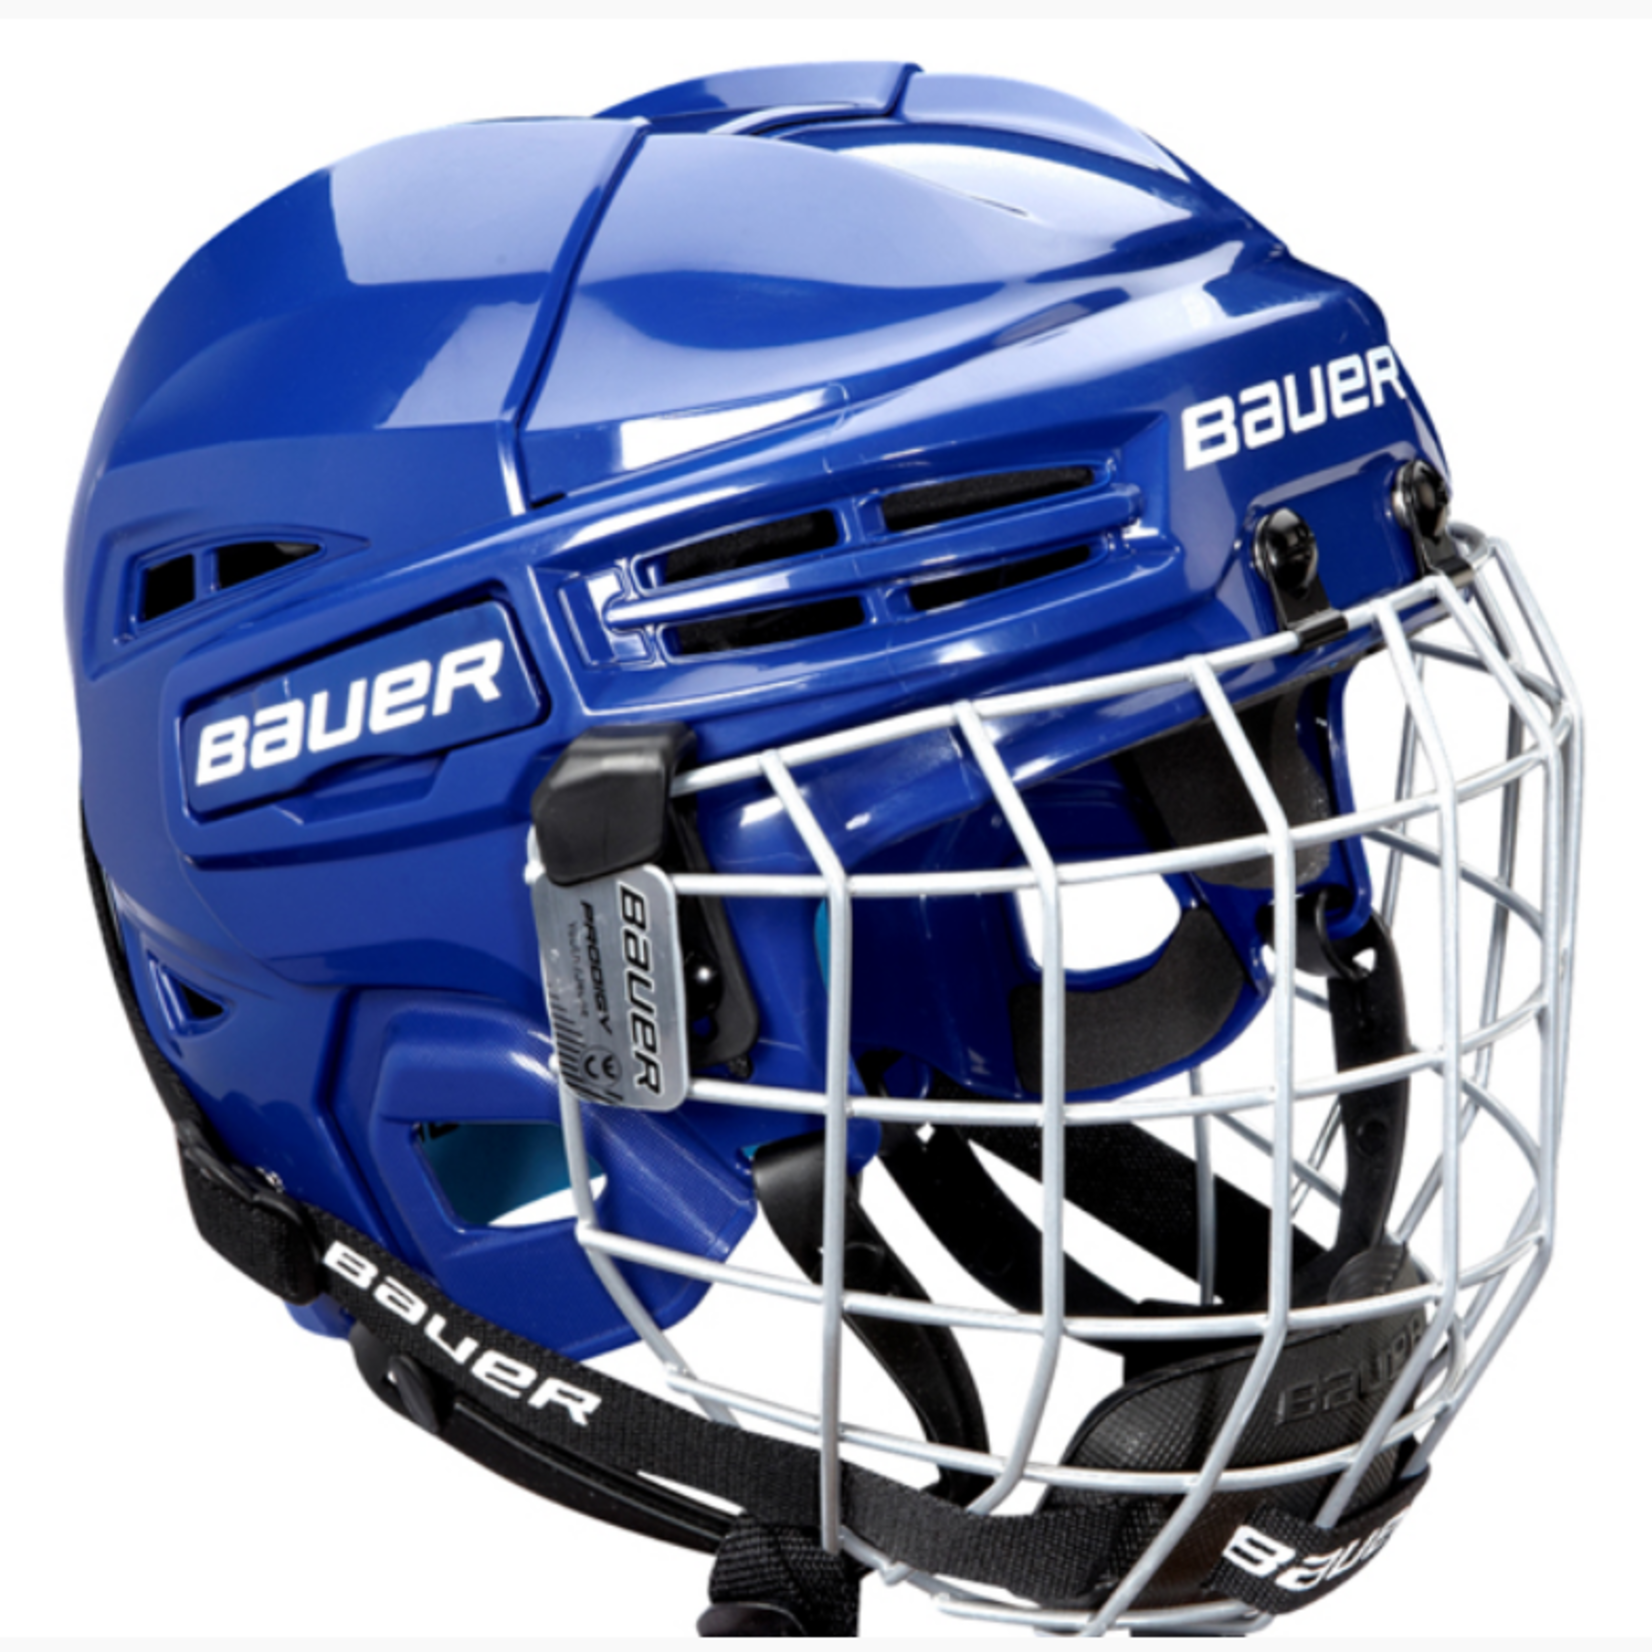 Bauer Bauer Prodigy Helmet Combo